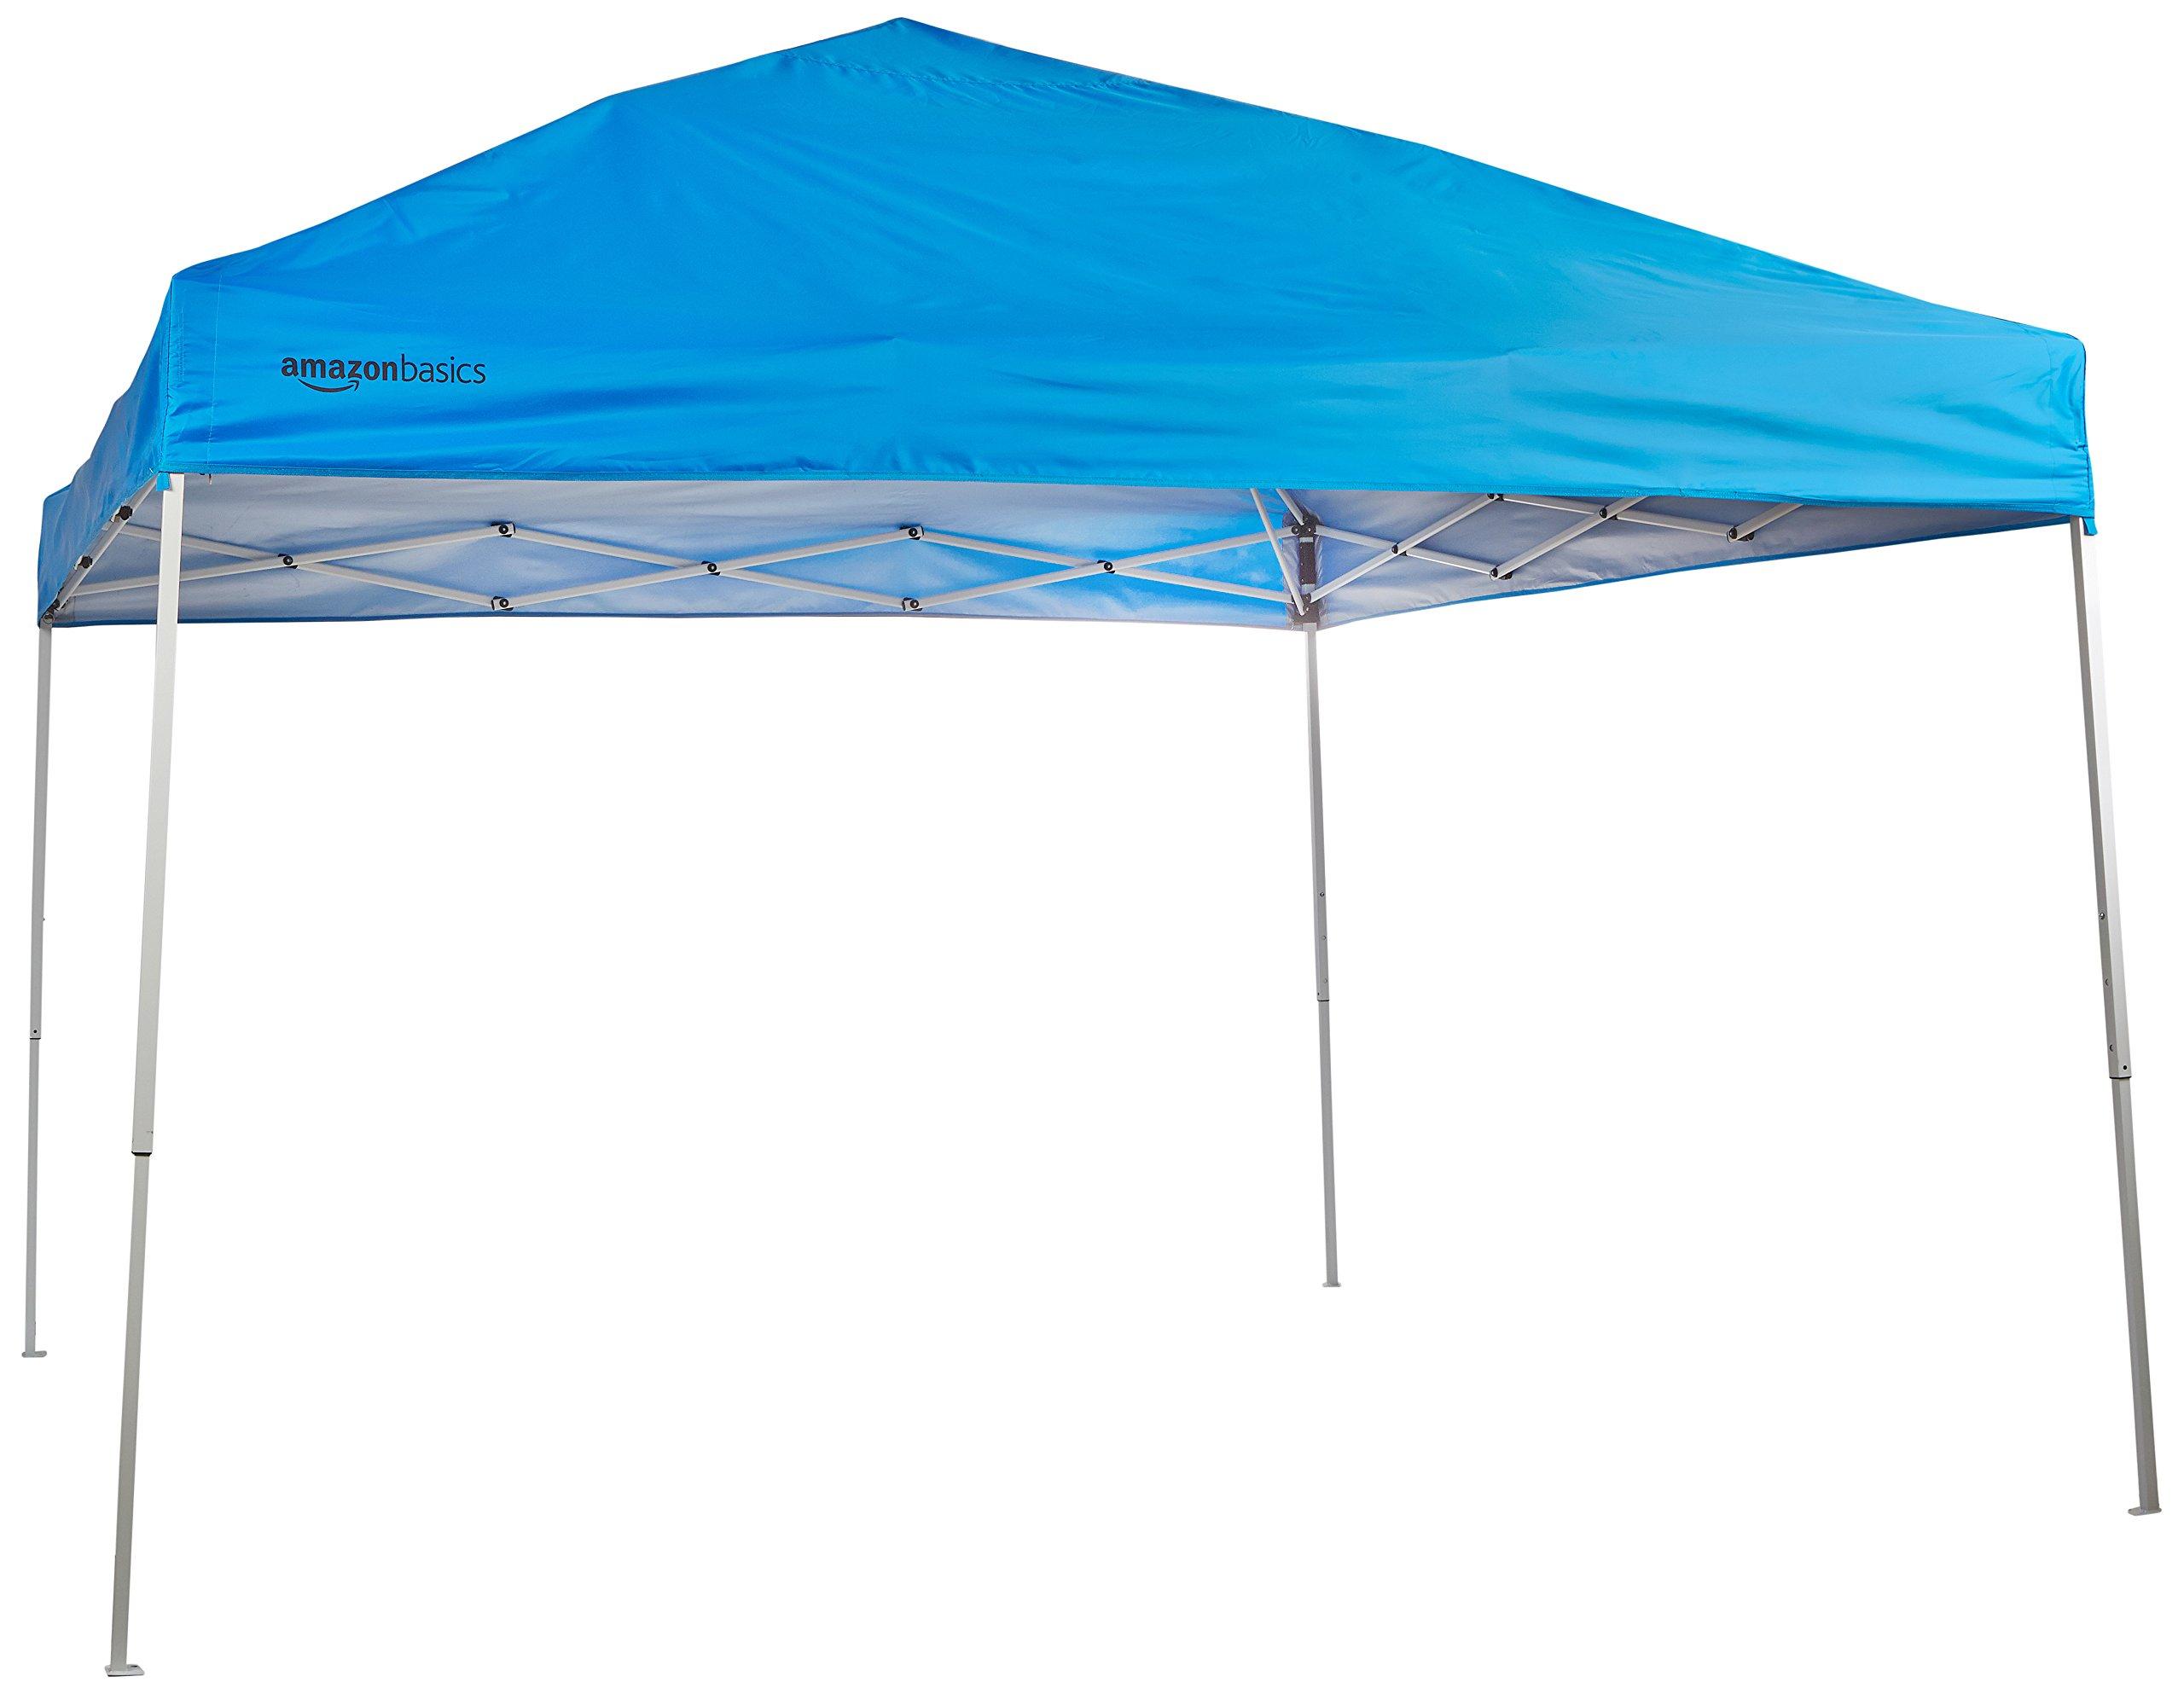 AmazonBasics Pop-Up Canopy Tent - 10u0027 x 10u0027 ...  sc 1 st  Amazon.com & Pop Up Awnings: Amazon.com